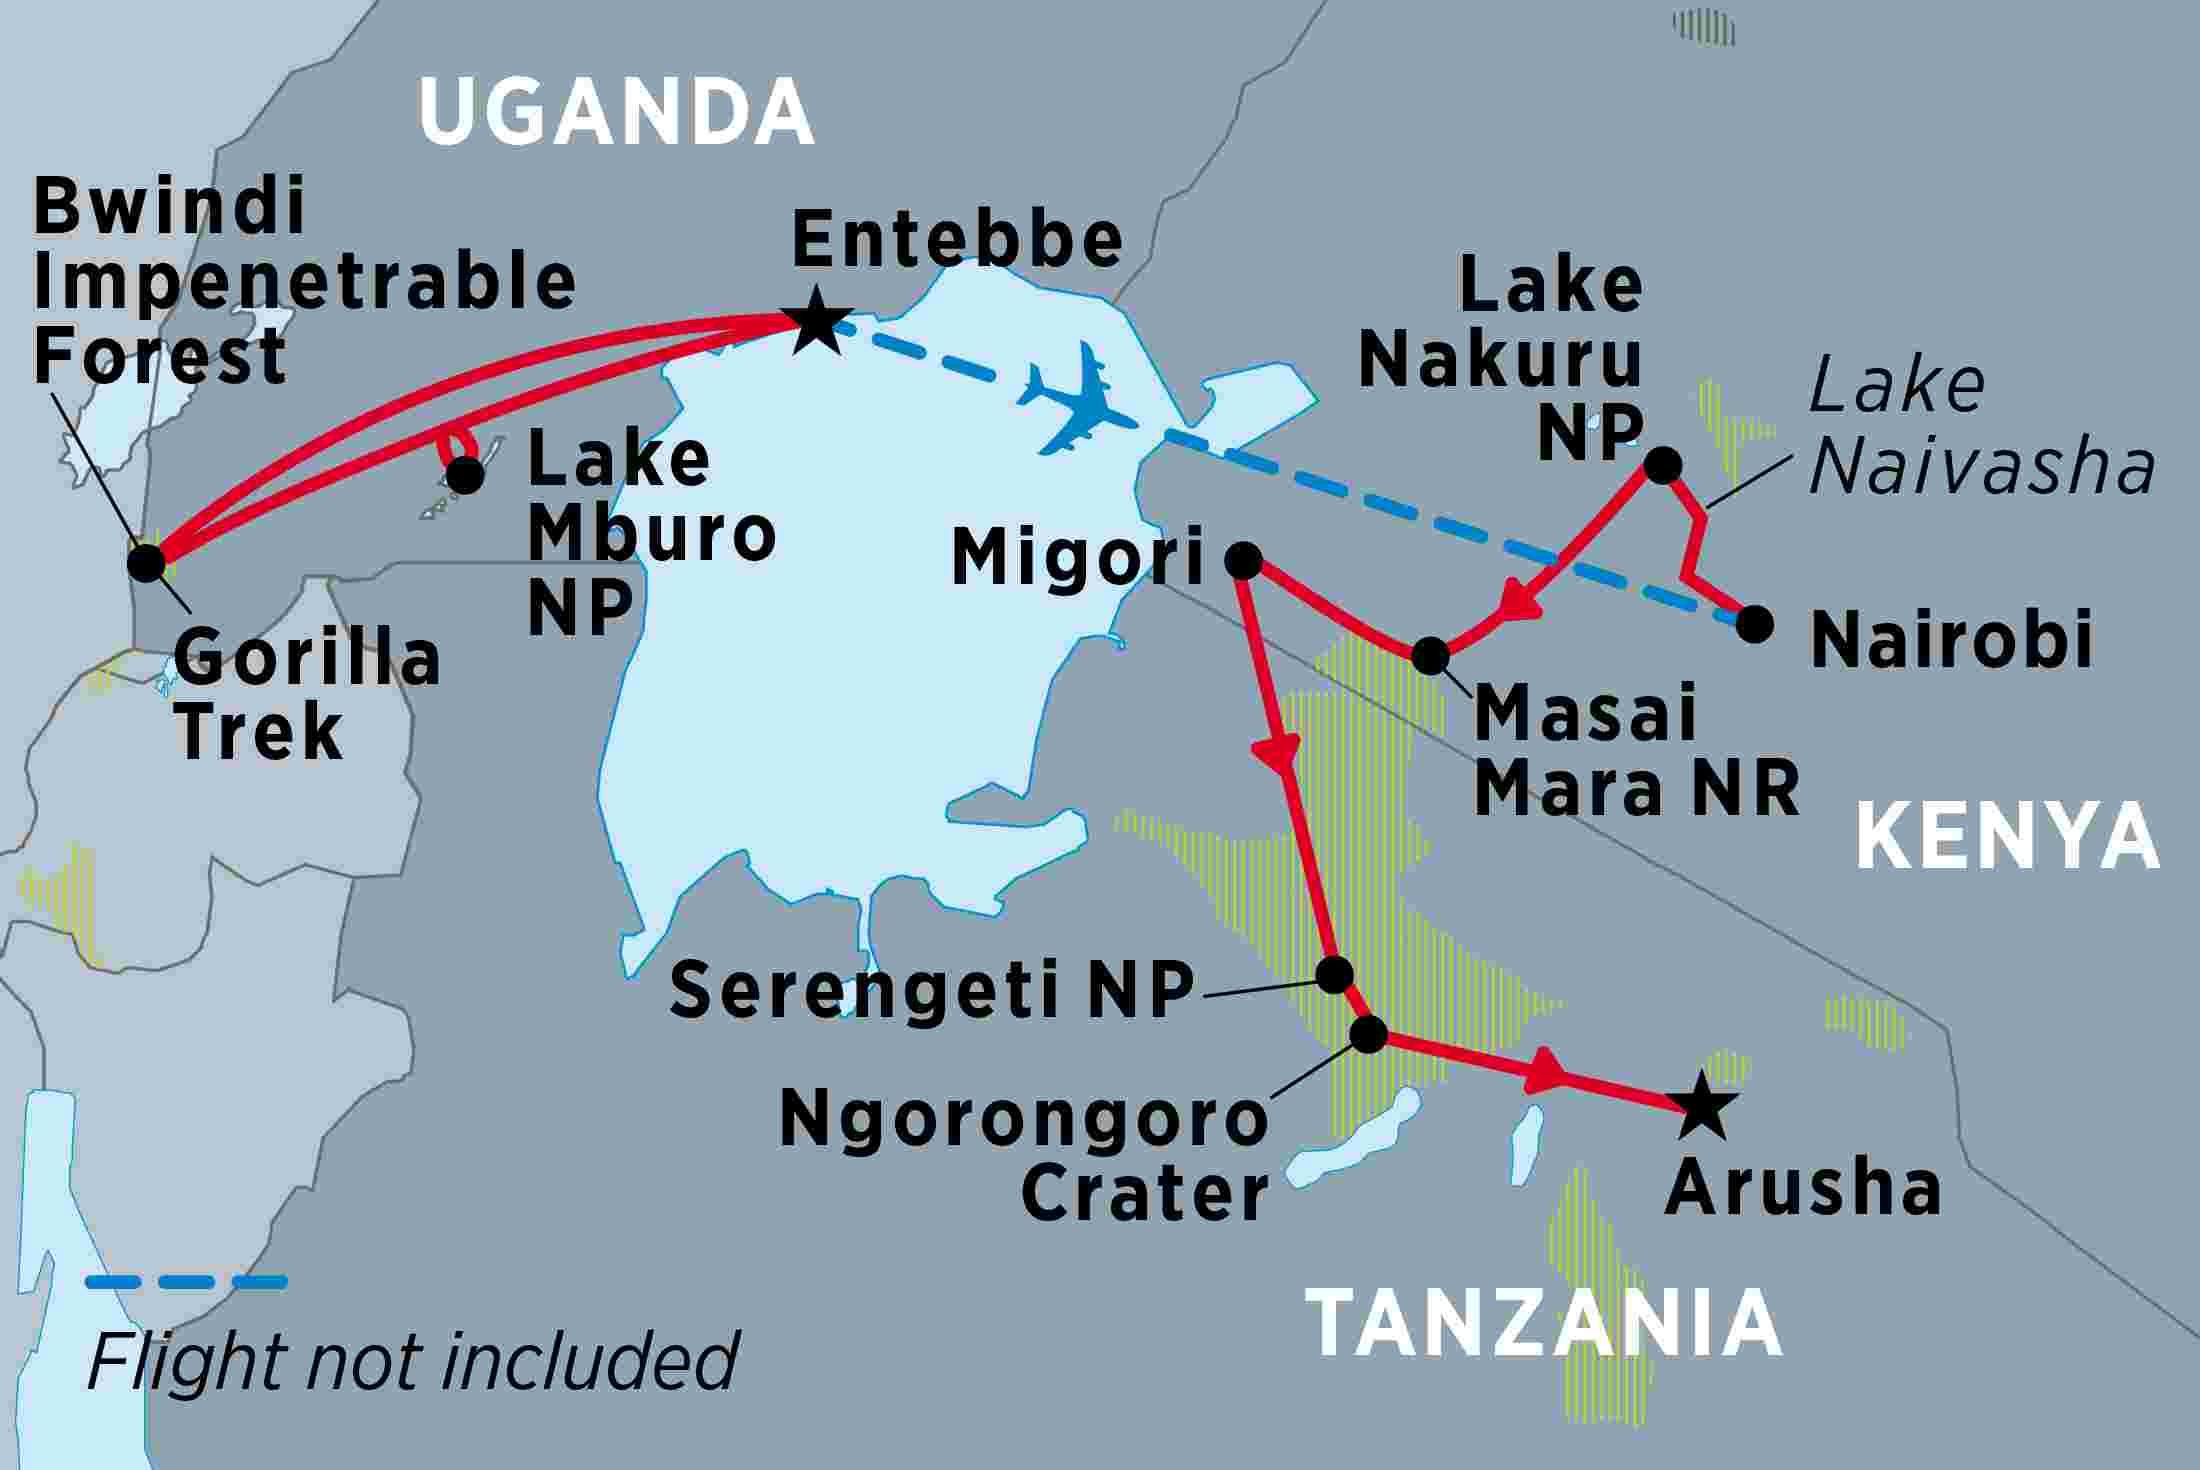 Serengeti & Silverbacks overview | Serengeti & Silverbacks on kenya nairobi map, kenya africa map, kenya canada map, kenya tourist map, kenya travel maps, mali map, sri lanka map, african serengeti map, malawi map, east africa map, kenya somalia map, burundi map, kenya africa elephants, senegal map, kenya game reserve map, iran map, kenya mozambique map, mt. kilimanjaro map, hawaii kenya map, kenya islands map,